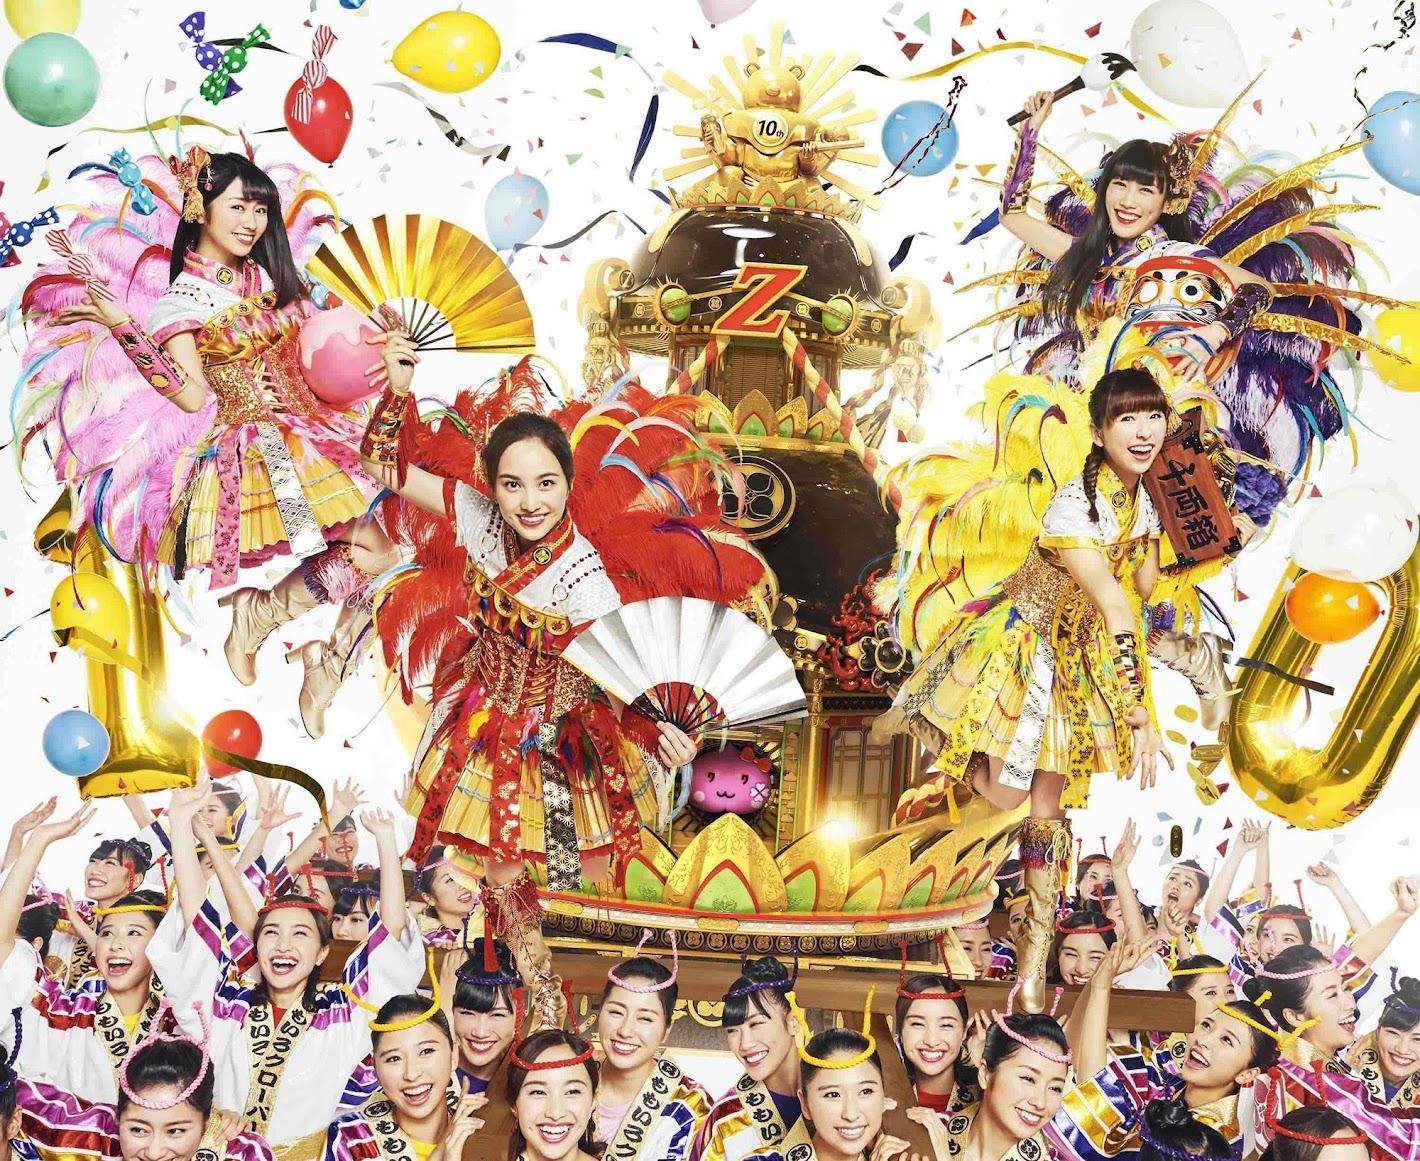 【迷迷演唱會】日本超人氣女團 桃色幸運草Z ( ももいろクローバーZ )明年一月來台開唱 粉絲直呼:「場地實在太小!」